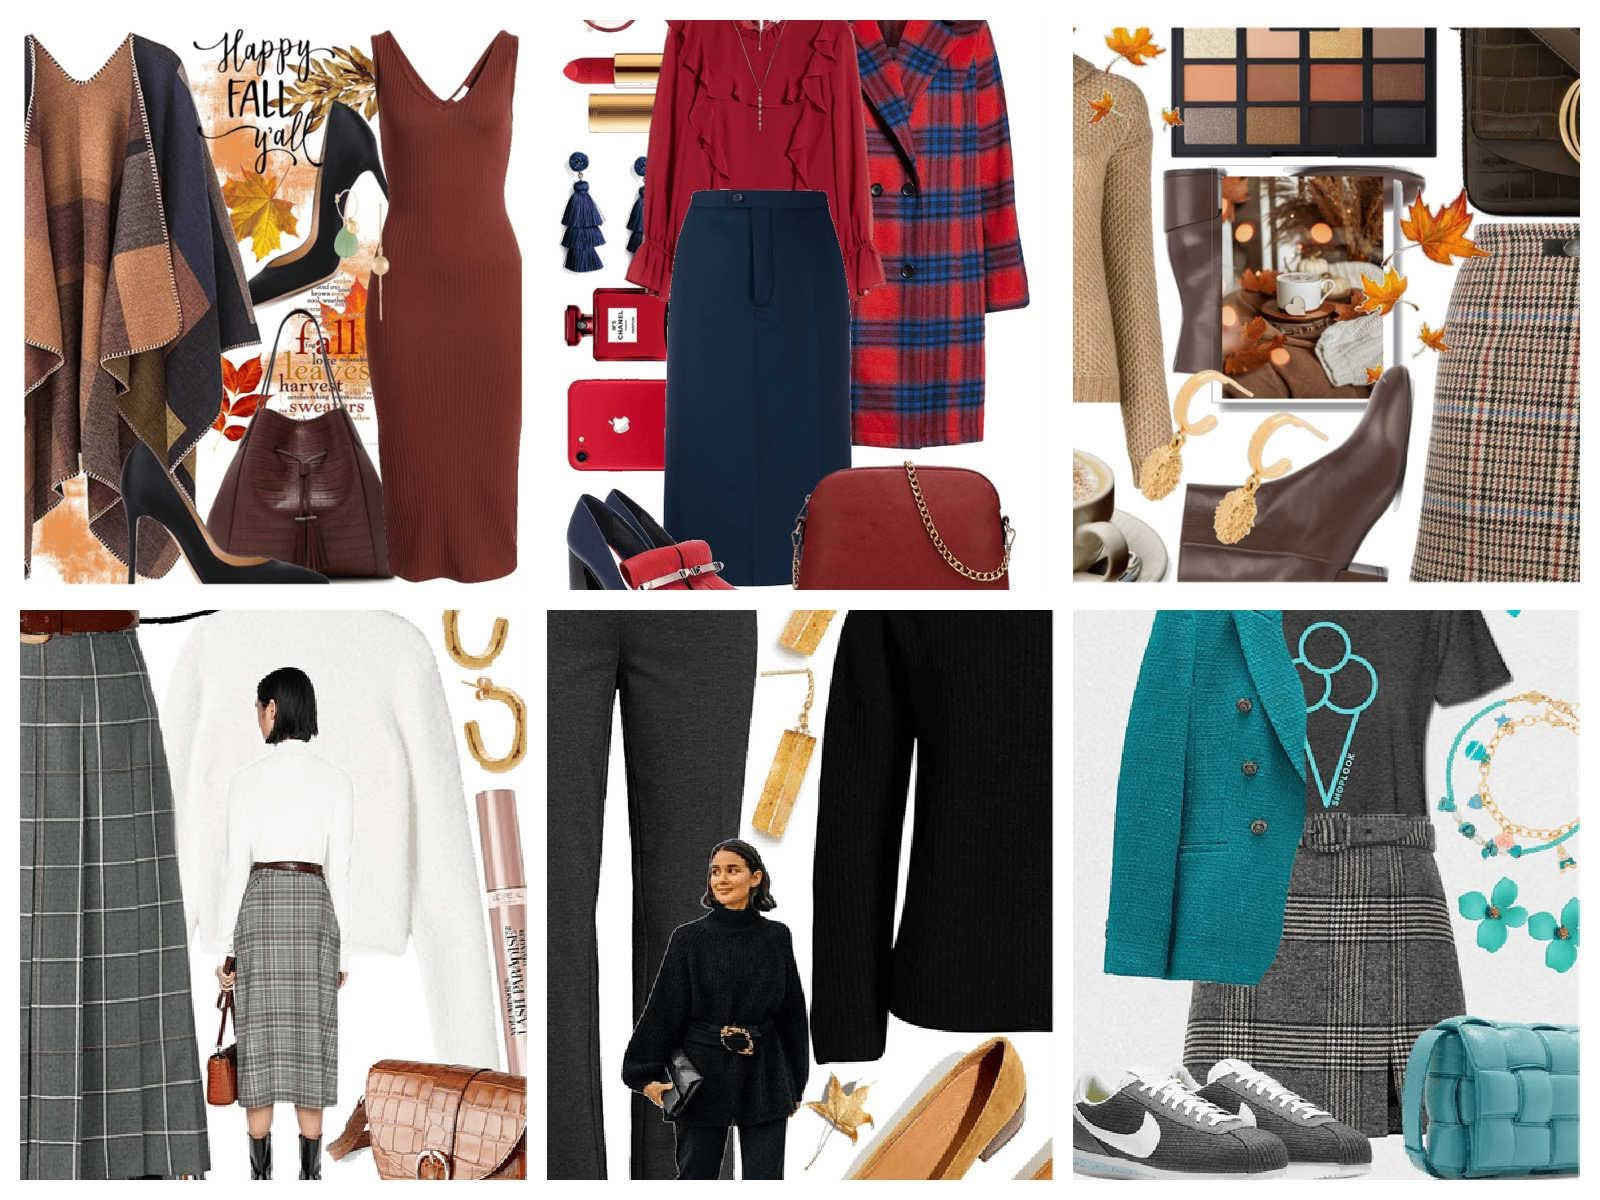 stil-moda-frumusete-la-scoala-profesori-moderni